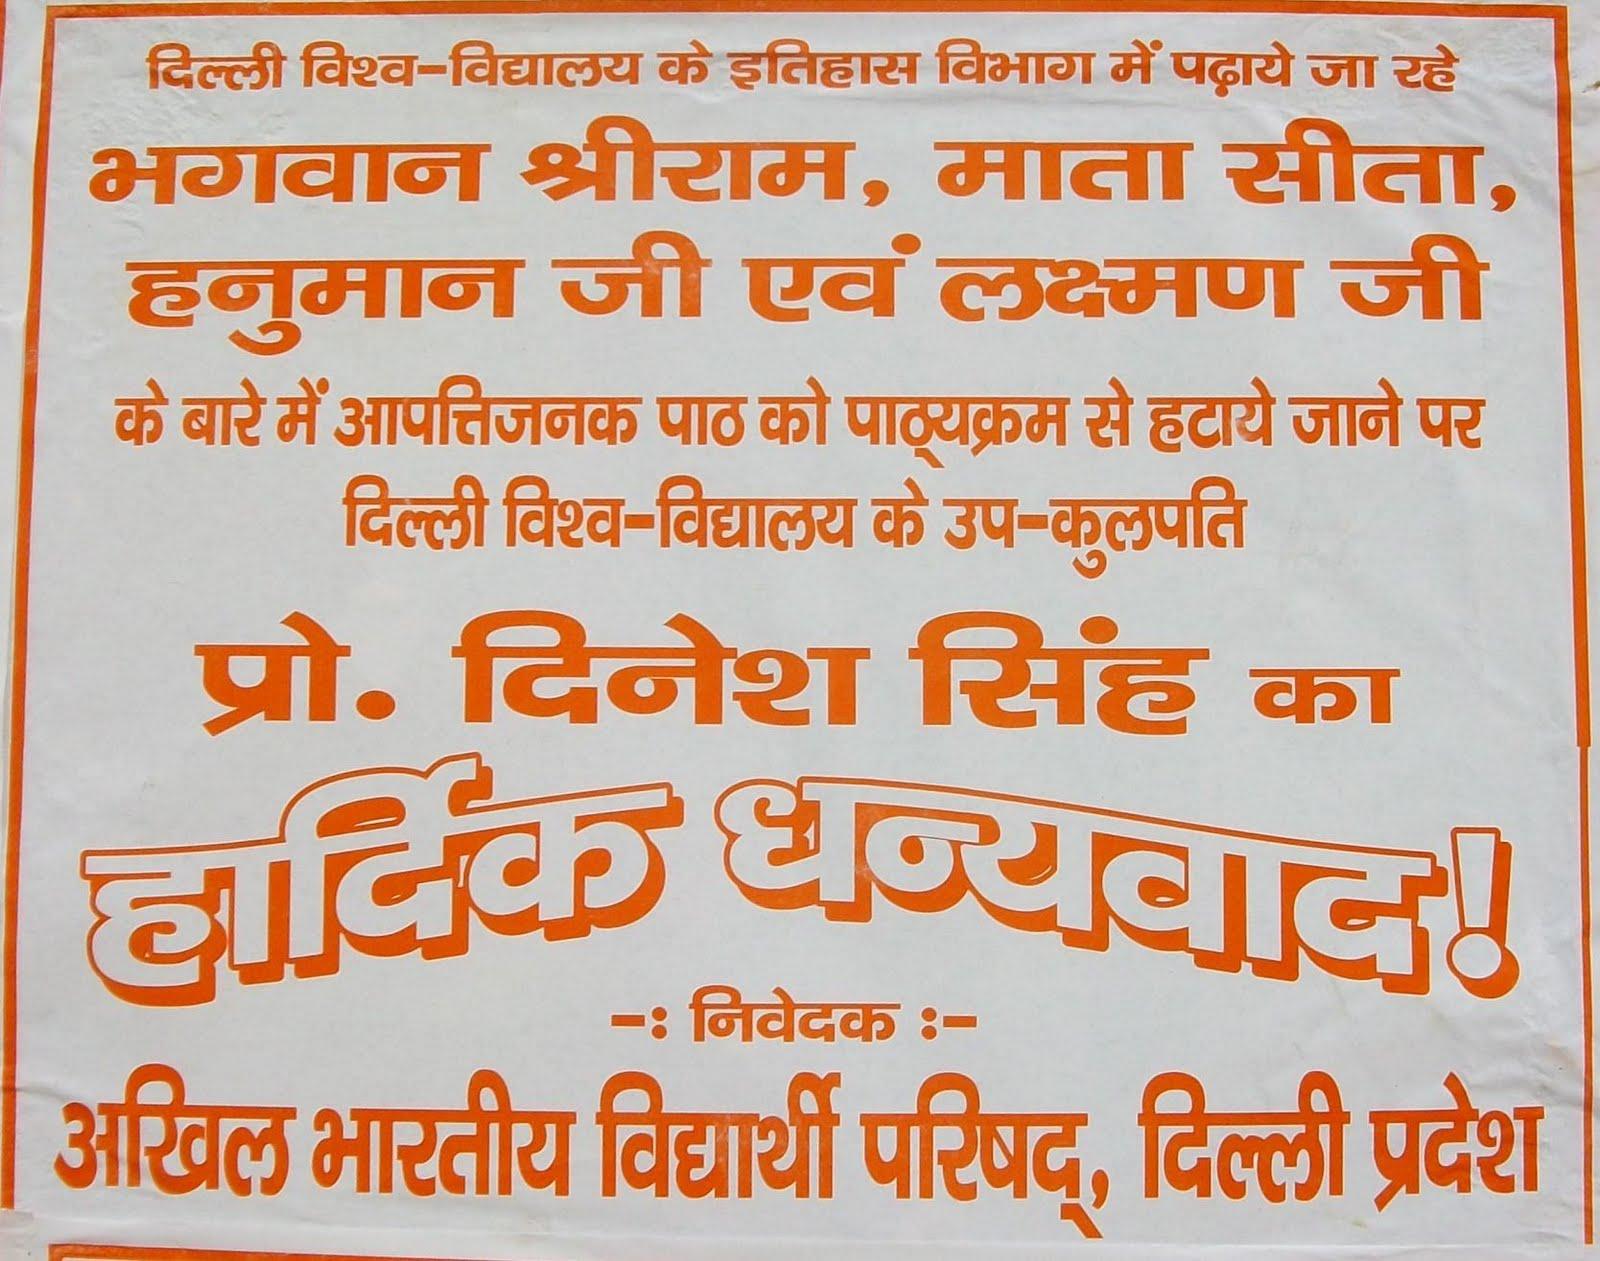 carvaka  poster by abvp congratulating the vice chancellor of delhi university